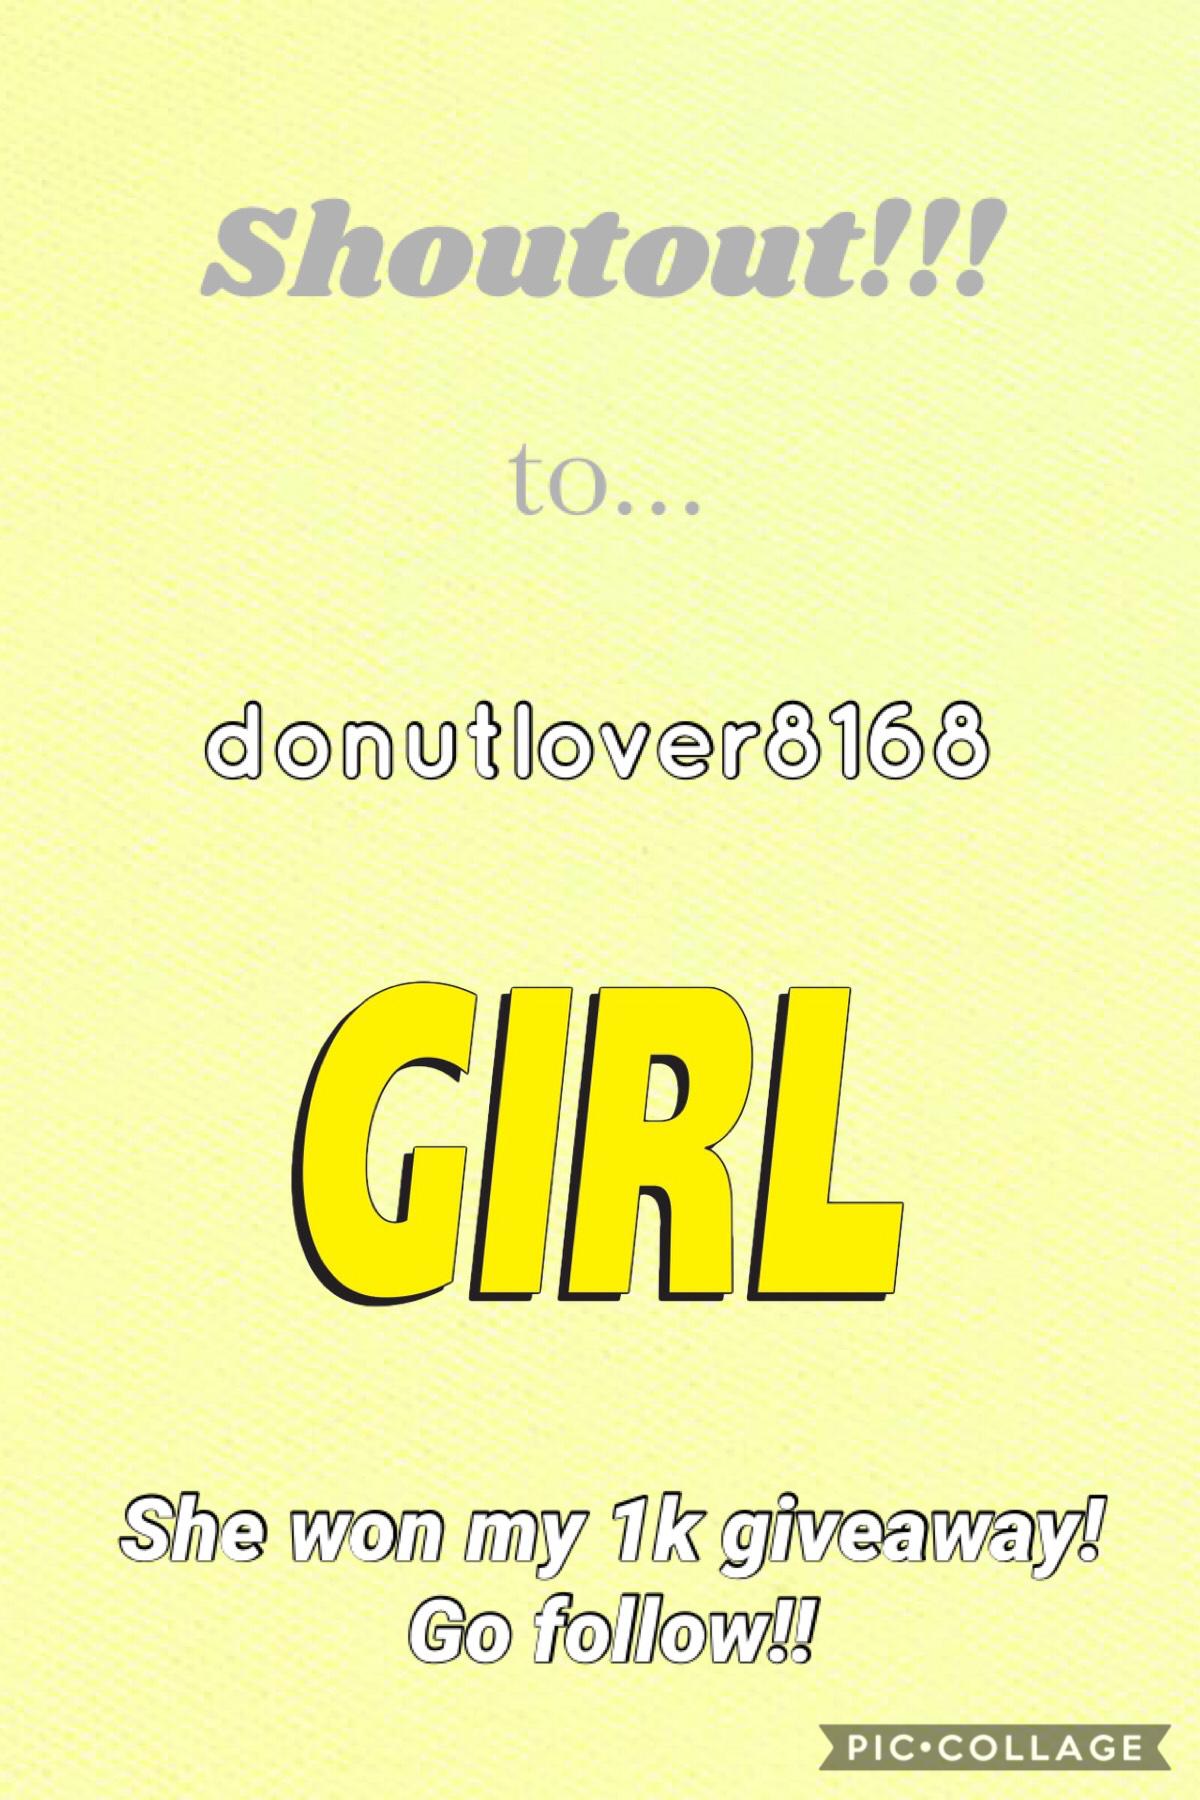 Follow! Btw I'm starting a yellow aesthetic theme